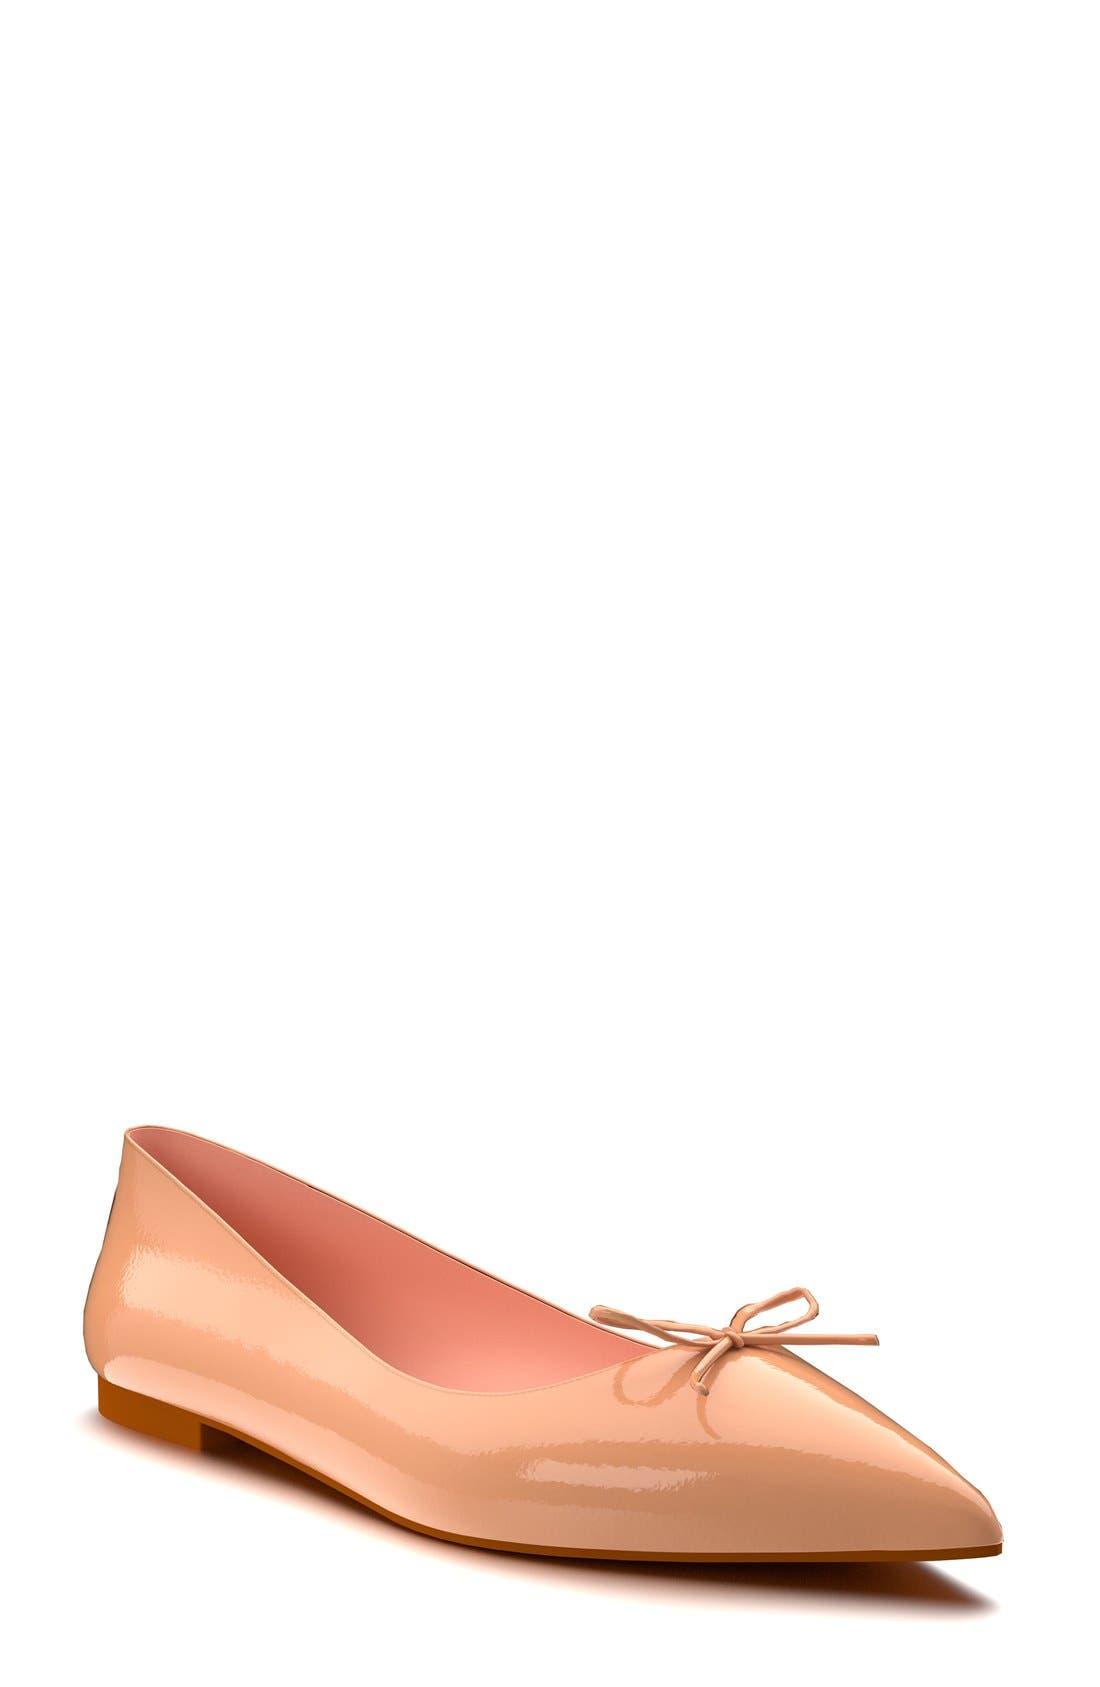 Shoes of Prey Pointy Toe Ballet Flat (Women)